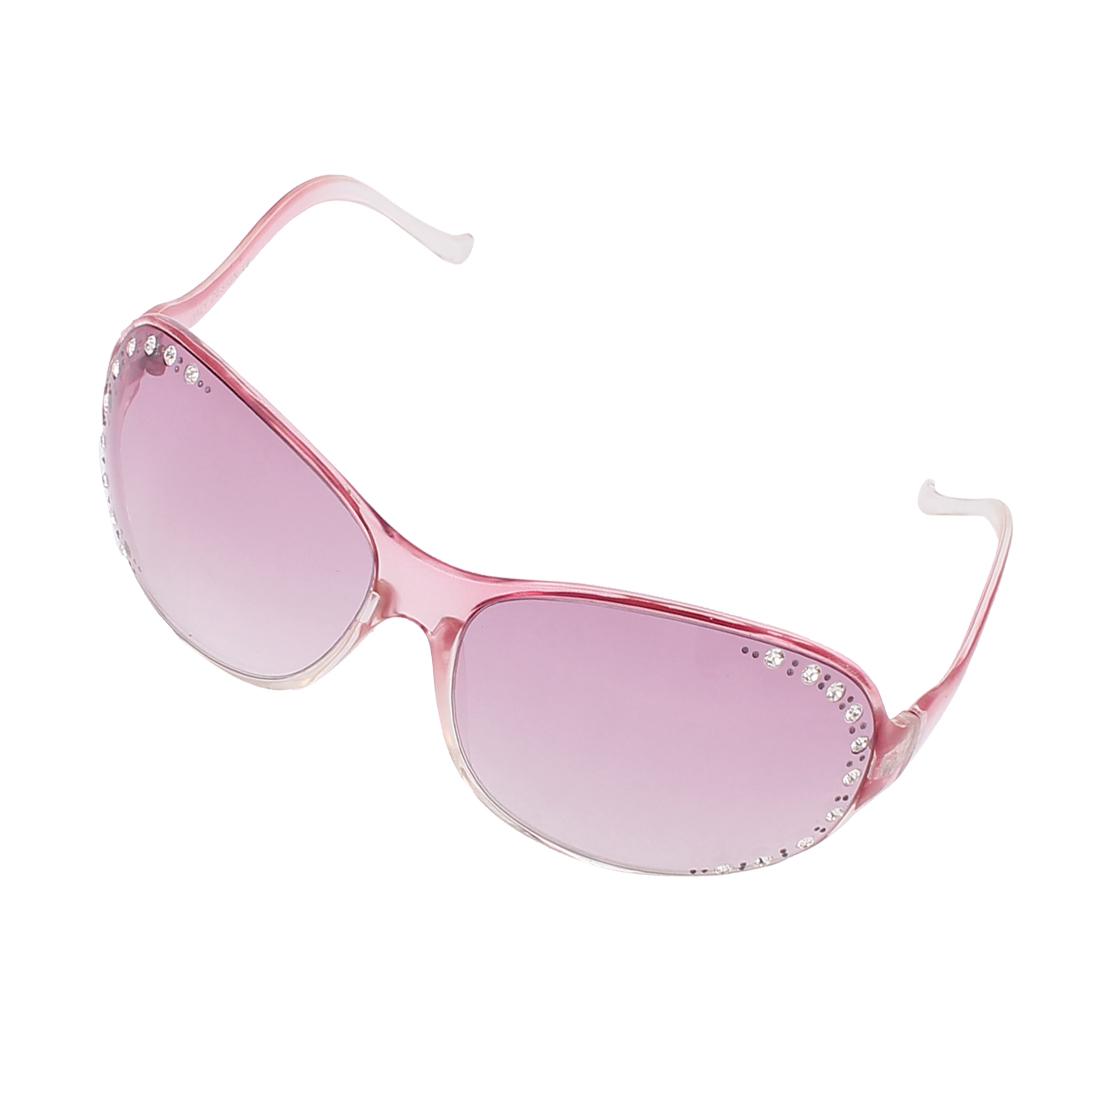 Women Rhinestone Diamond Decor Oversized Sunglasses Eyewear Glasses